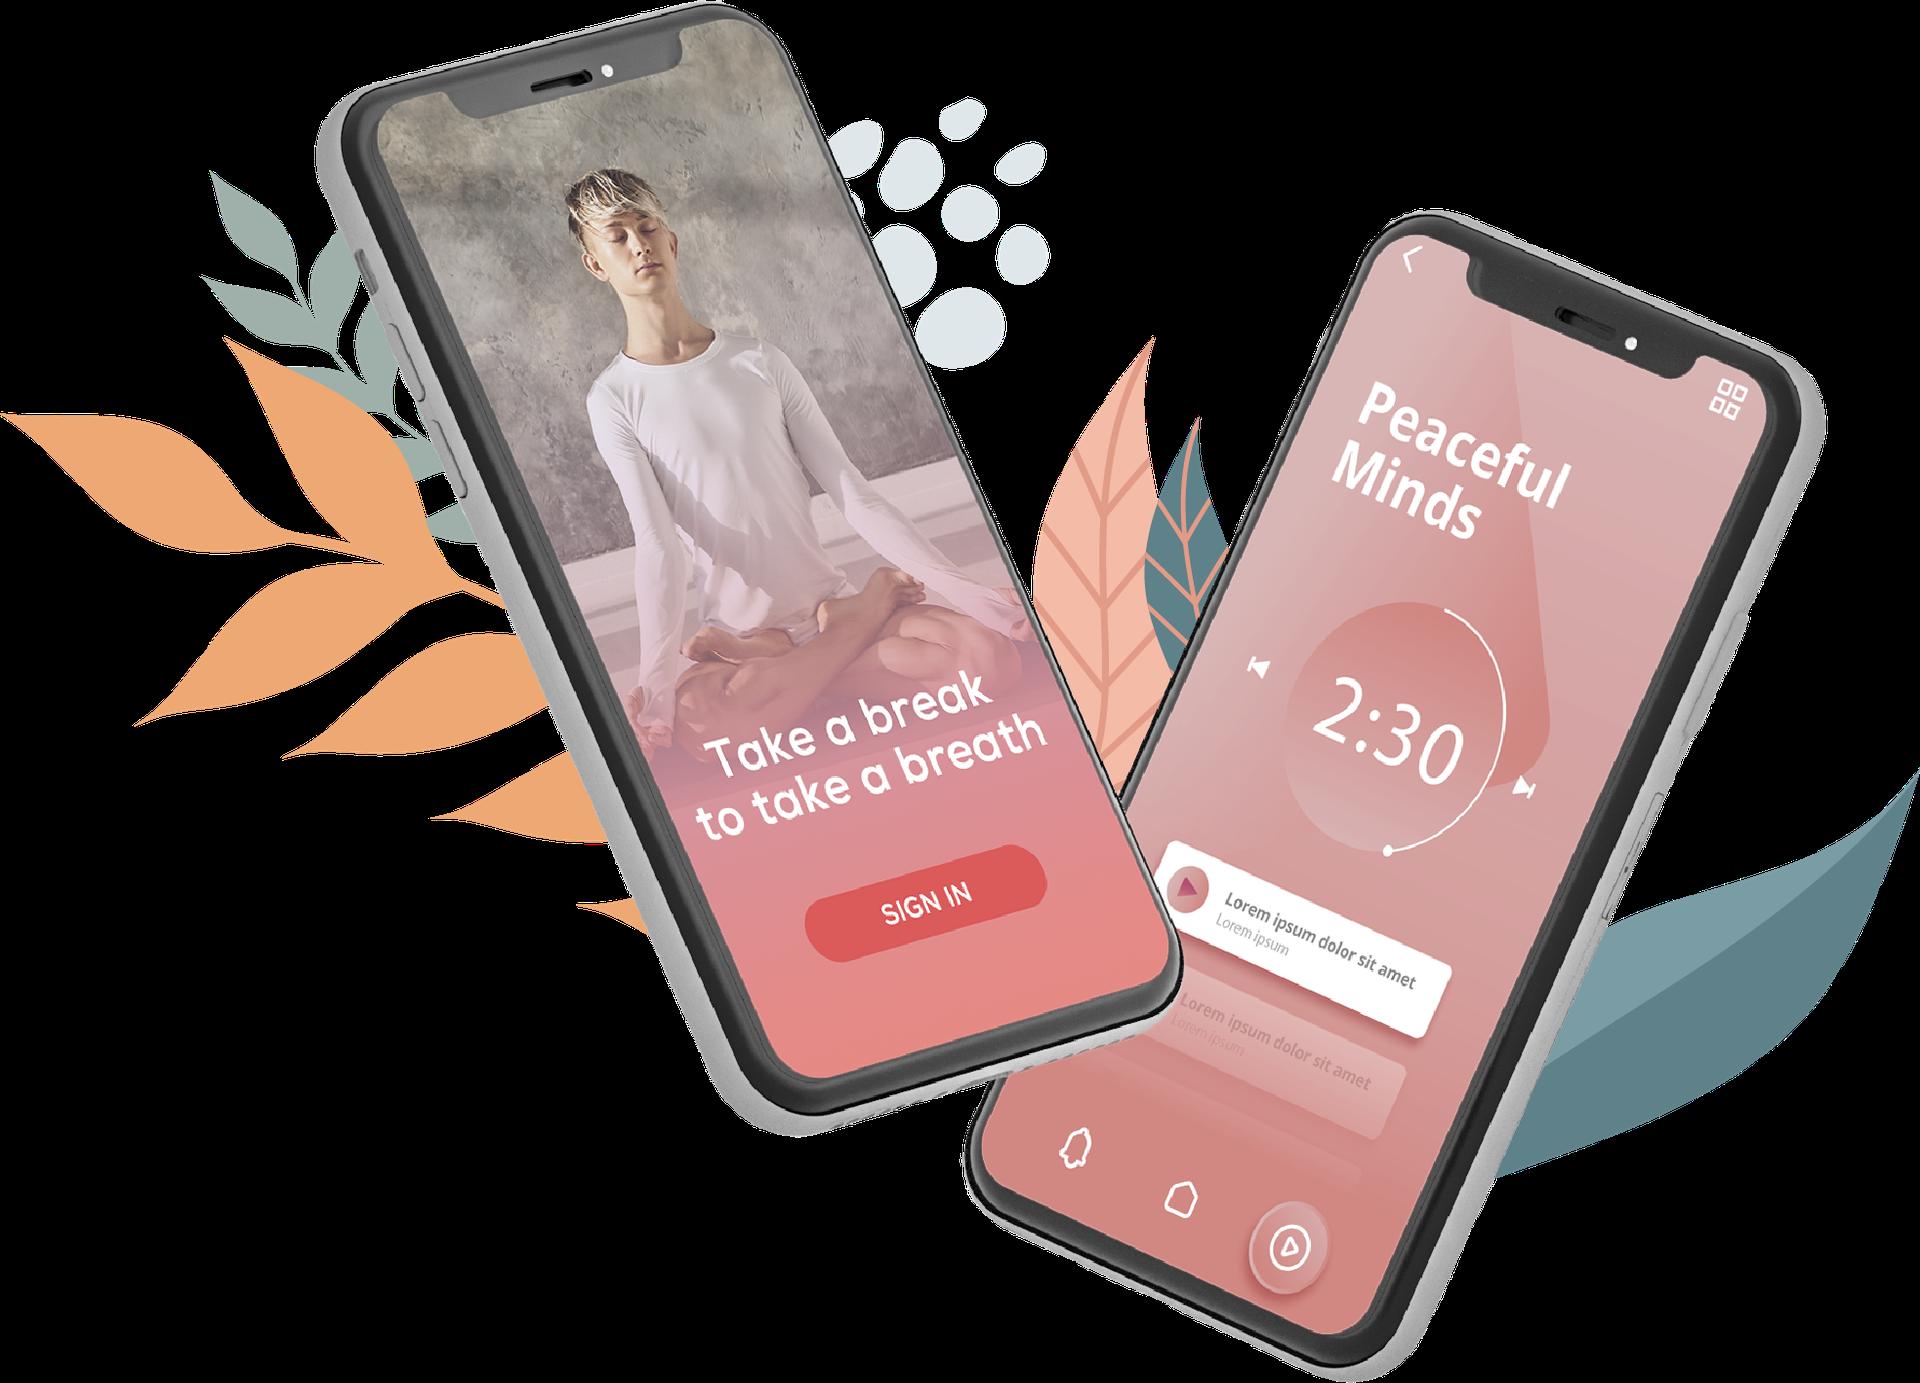 Mobile mockup with meditation app on screen